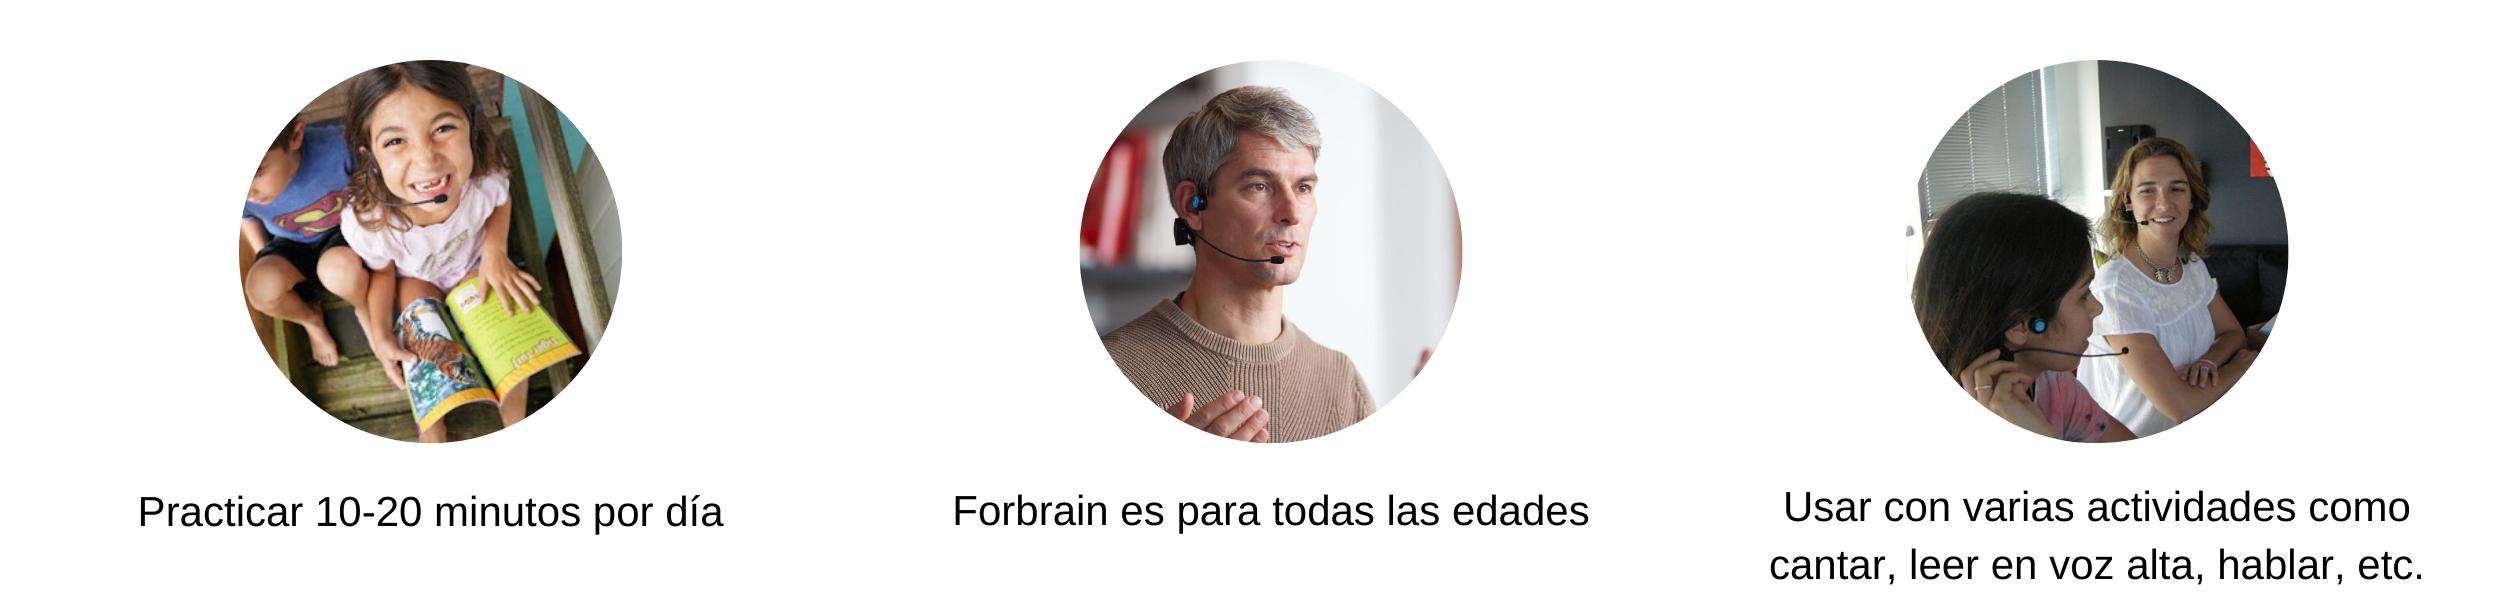 Copy of Forbrain_is_easy_spanish